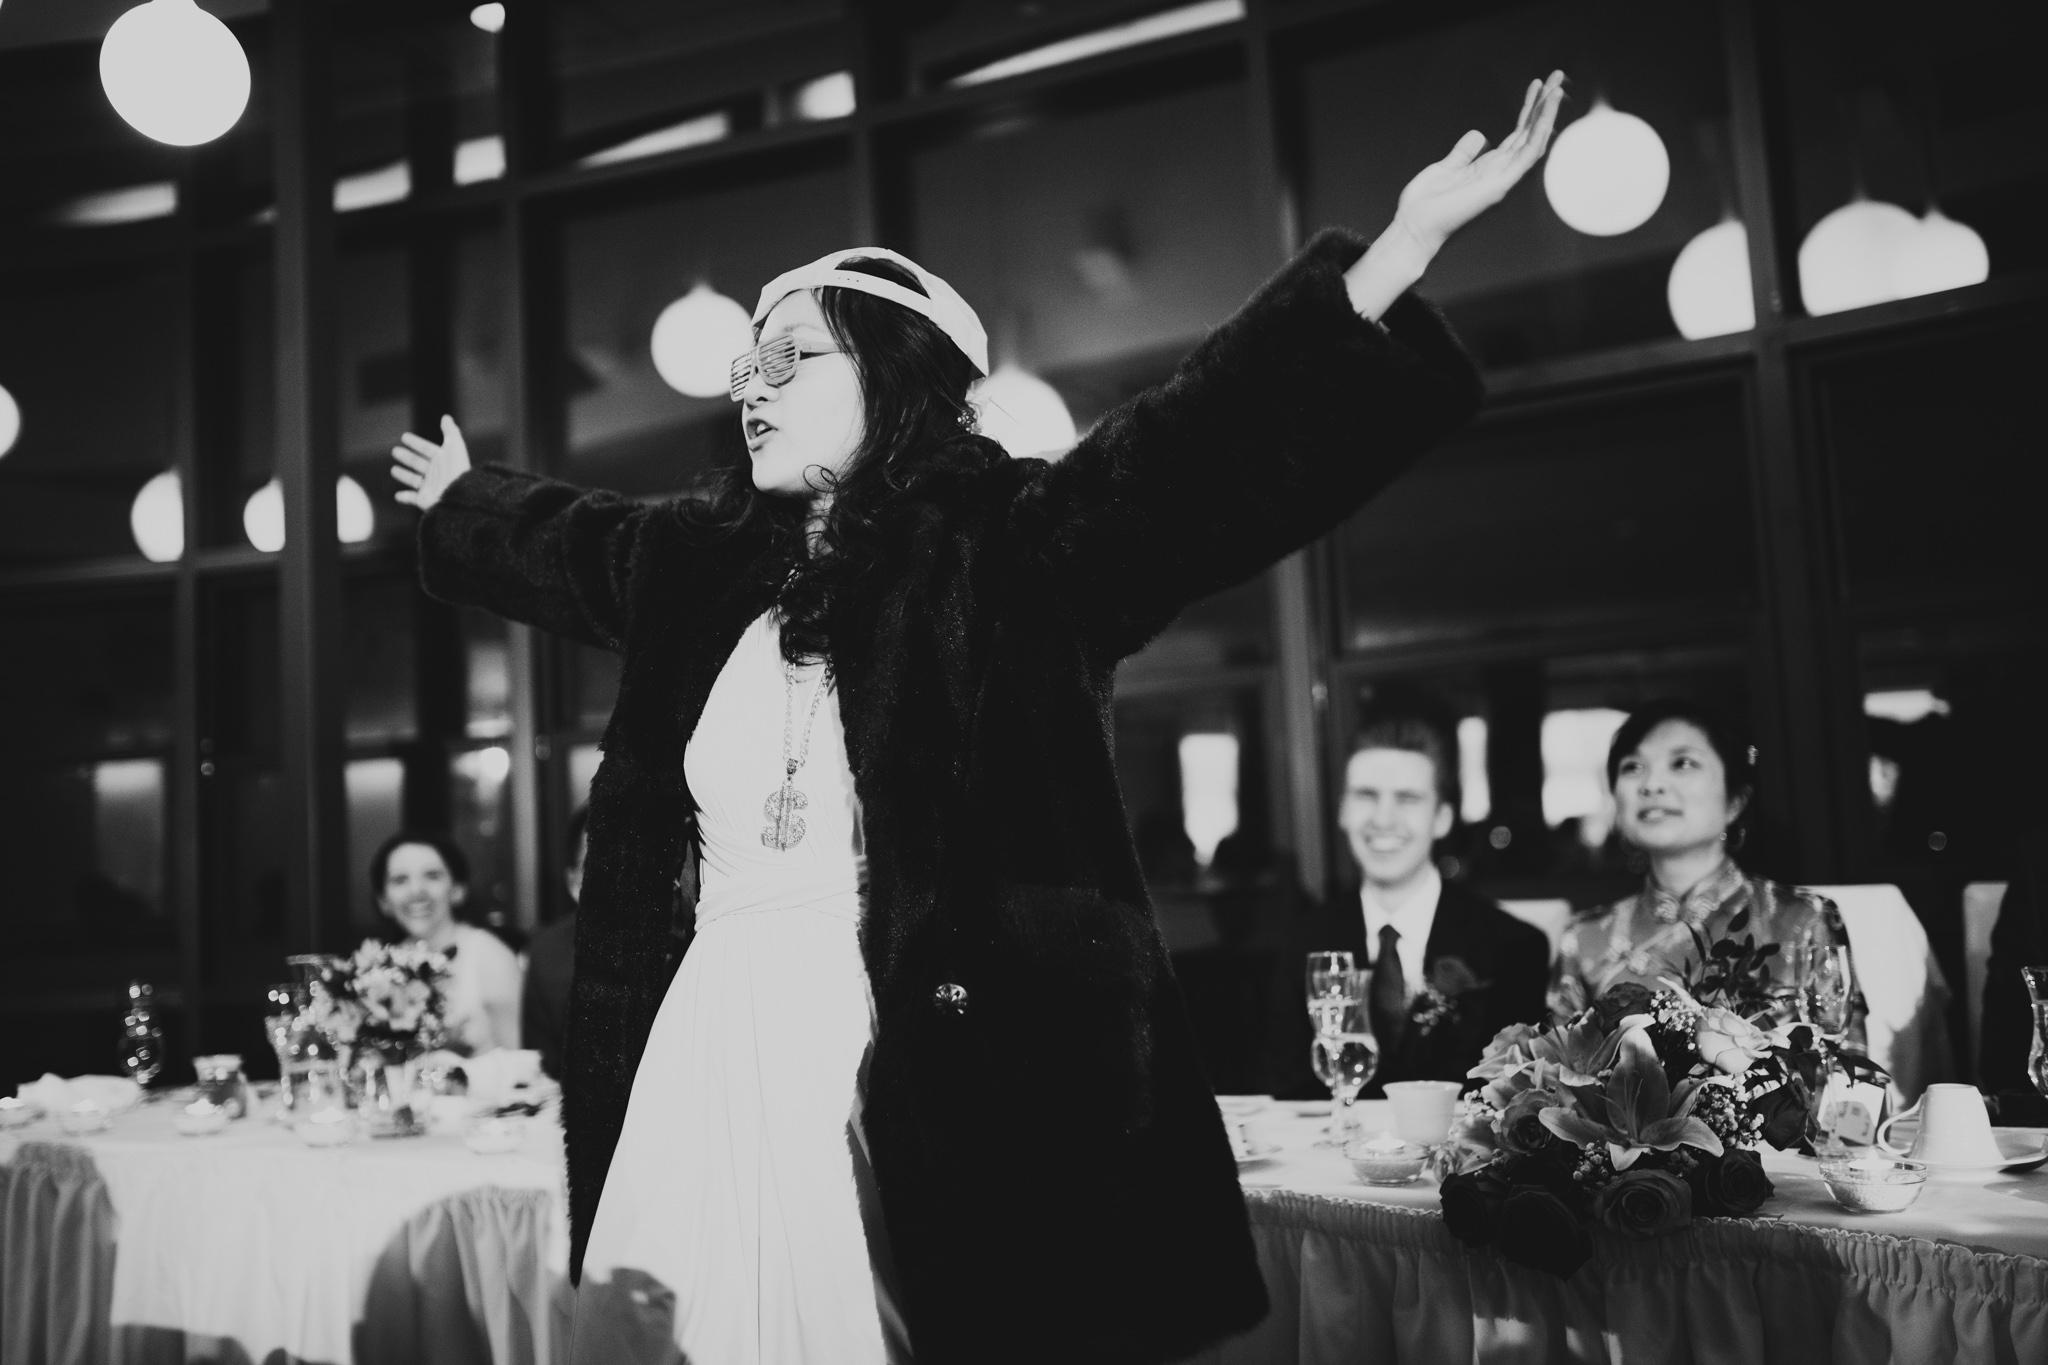 632-WEB-Jonathan-Kuhn-Photography-Alicia-Gabe-Wedding-4150.jpg